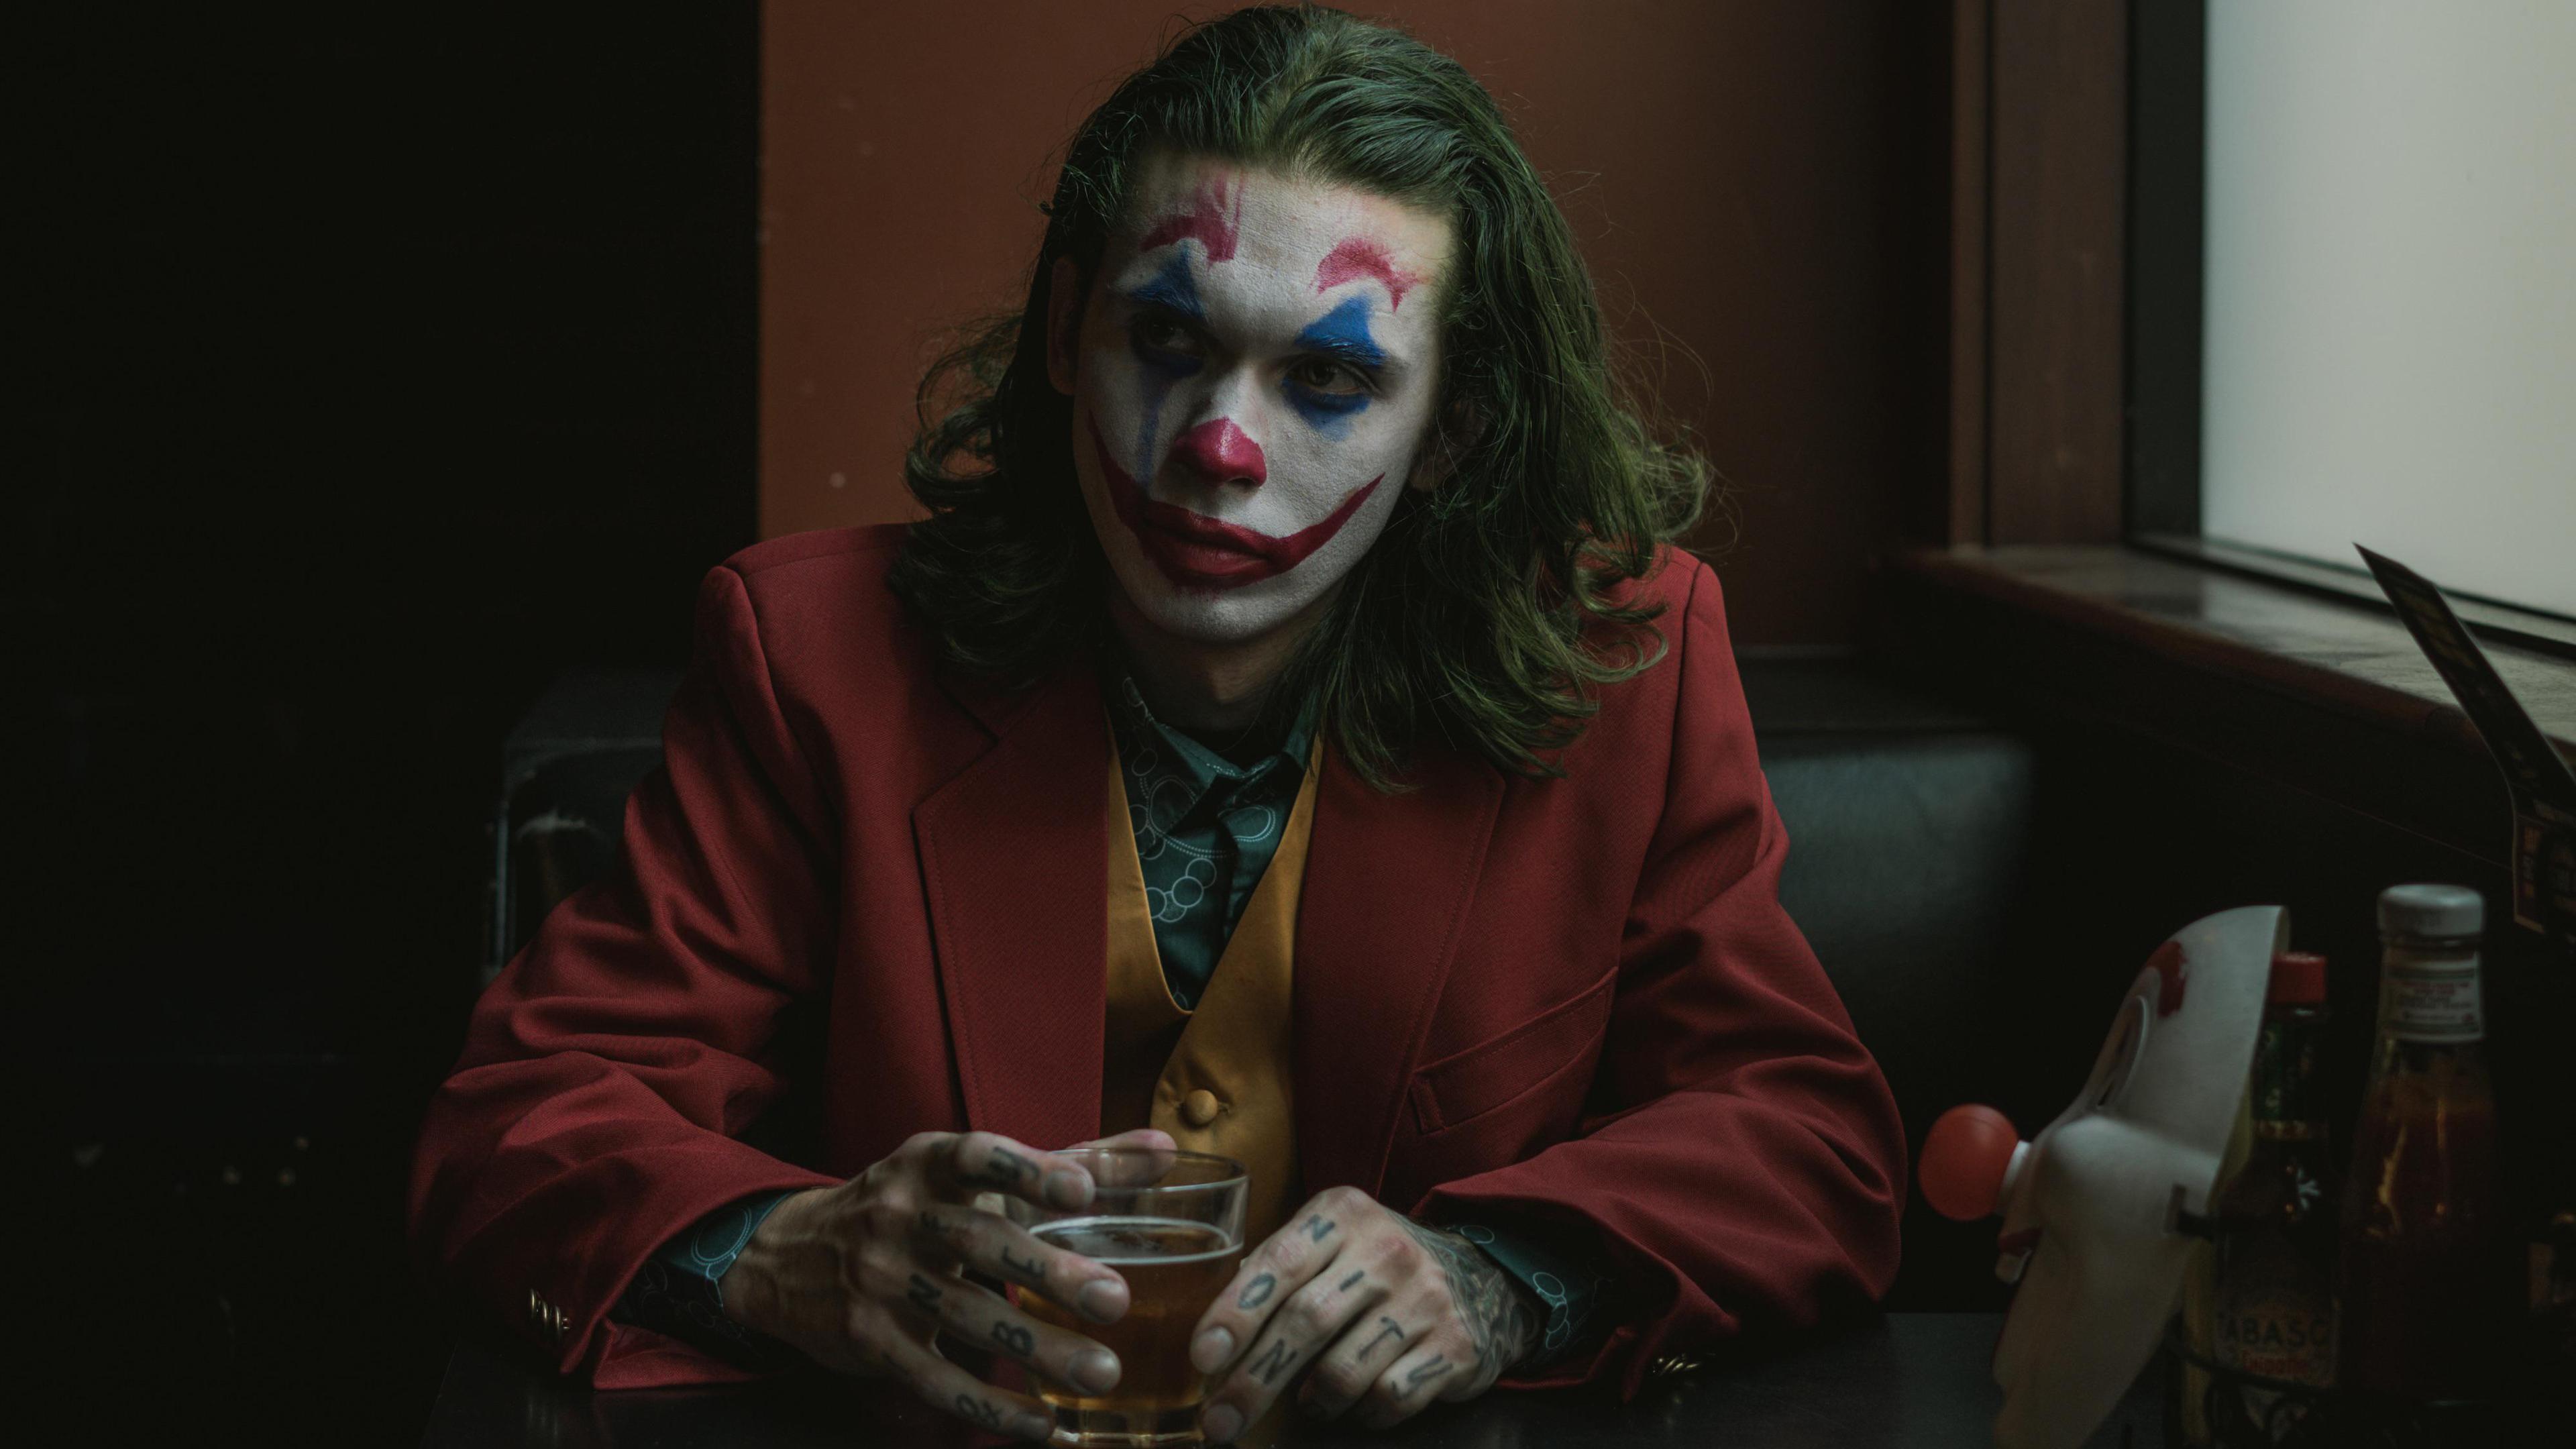 joker movie cosplay 1569186353 - Joker Movie Cosplay - superheroes wallpapers, joker wallpapers, hd-wallpapers, cosplay wallpapers, 4k-wallpapers